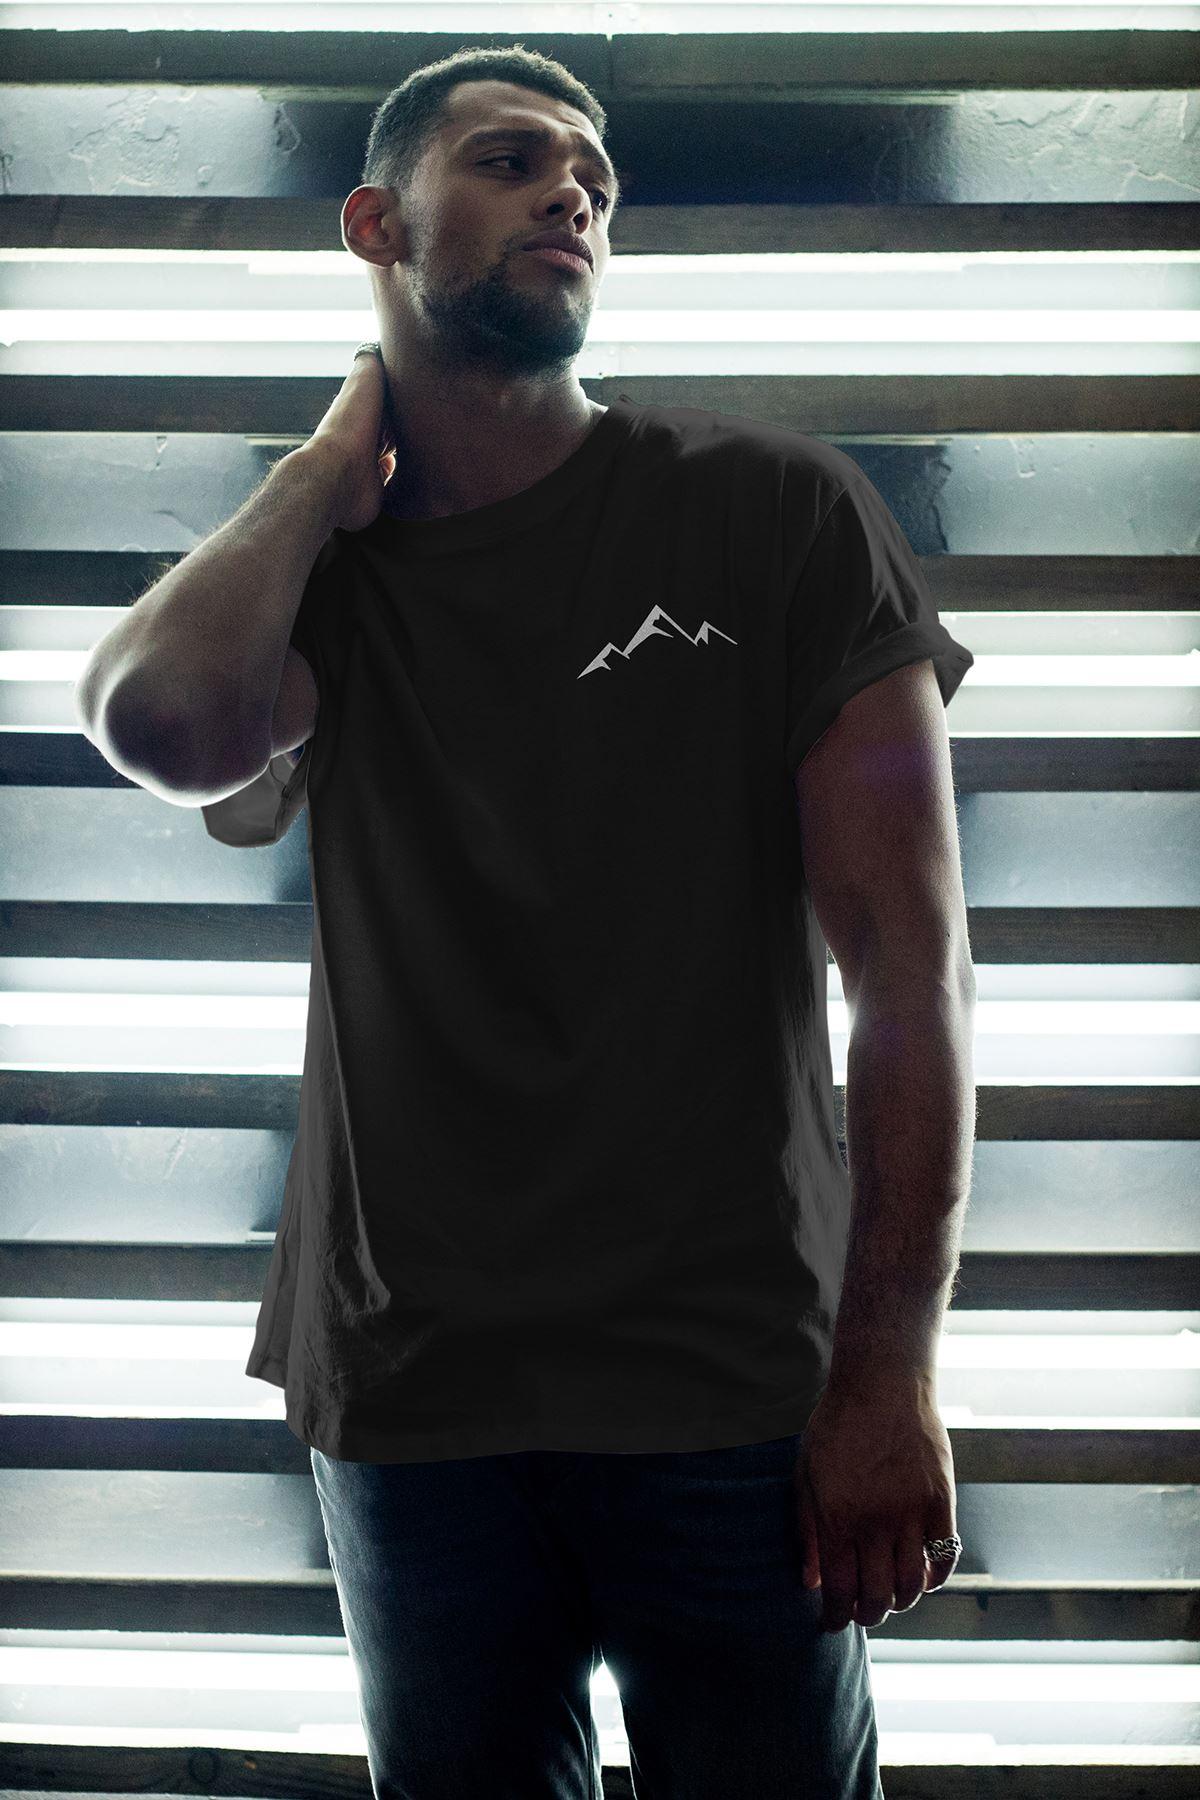 Little Mountain Siyah Erkek Oversize Tshirt - Tişört